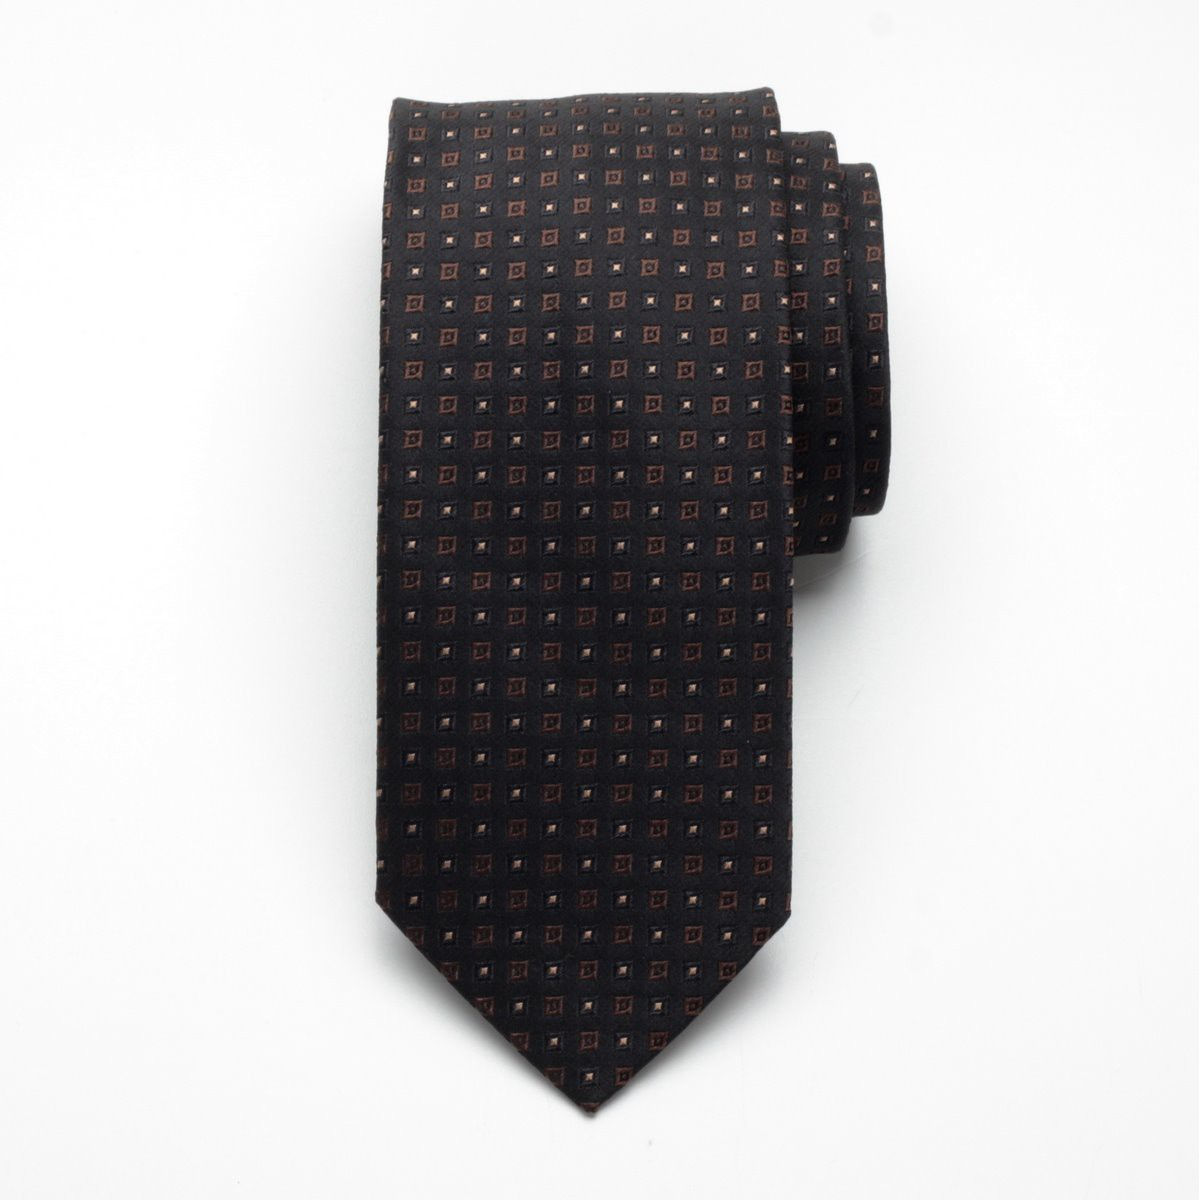 Krawat jedwabny Fine Selection (wzór 96)